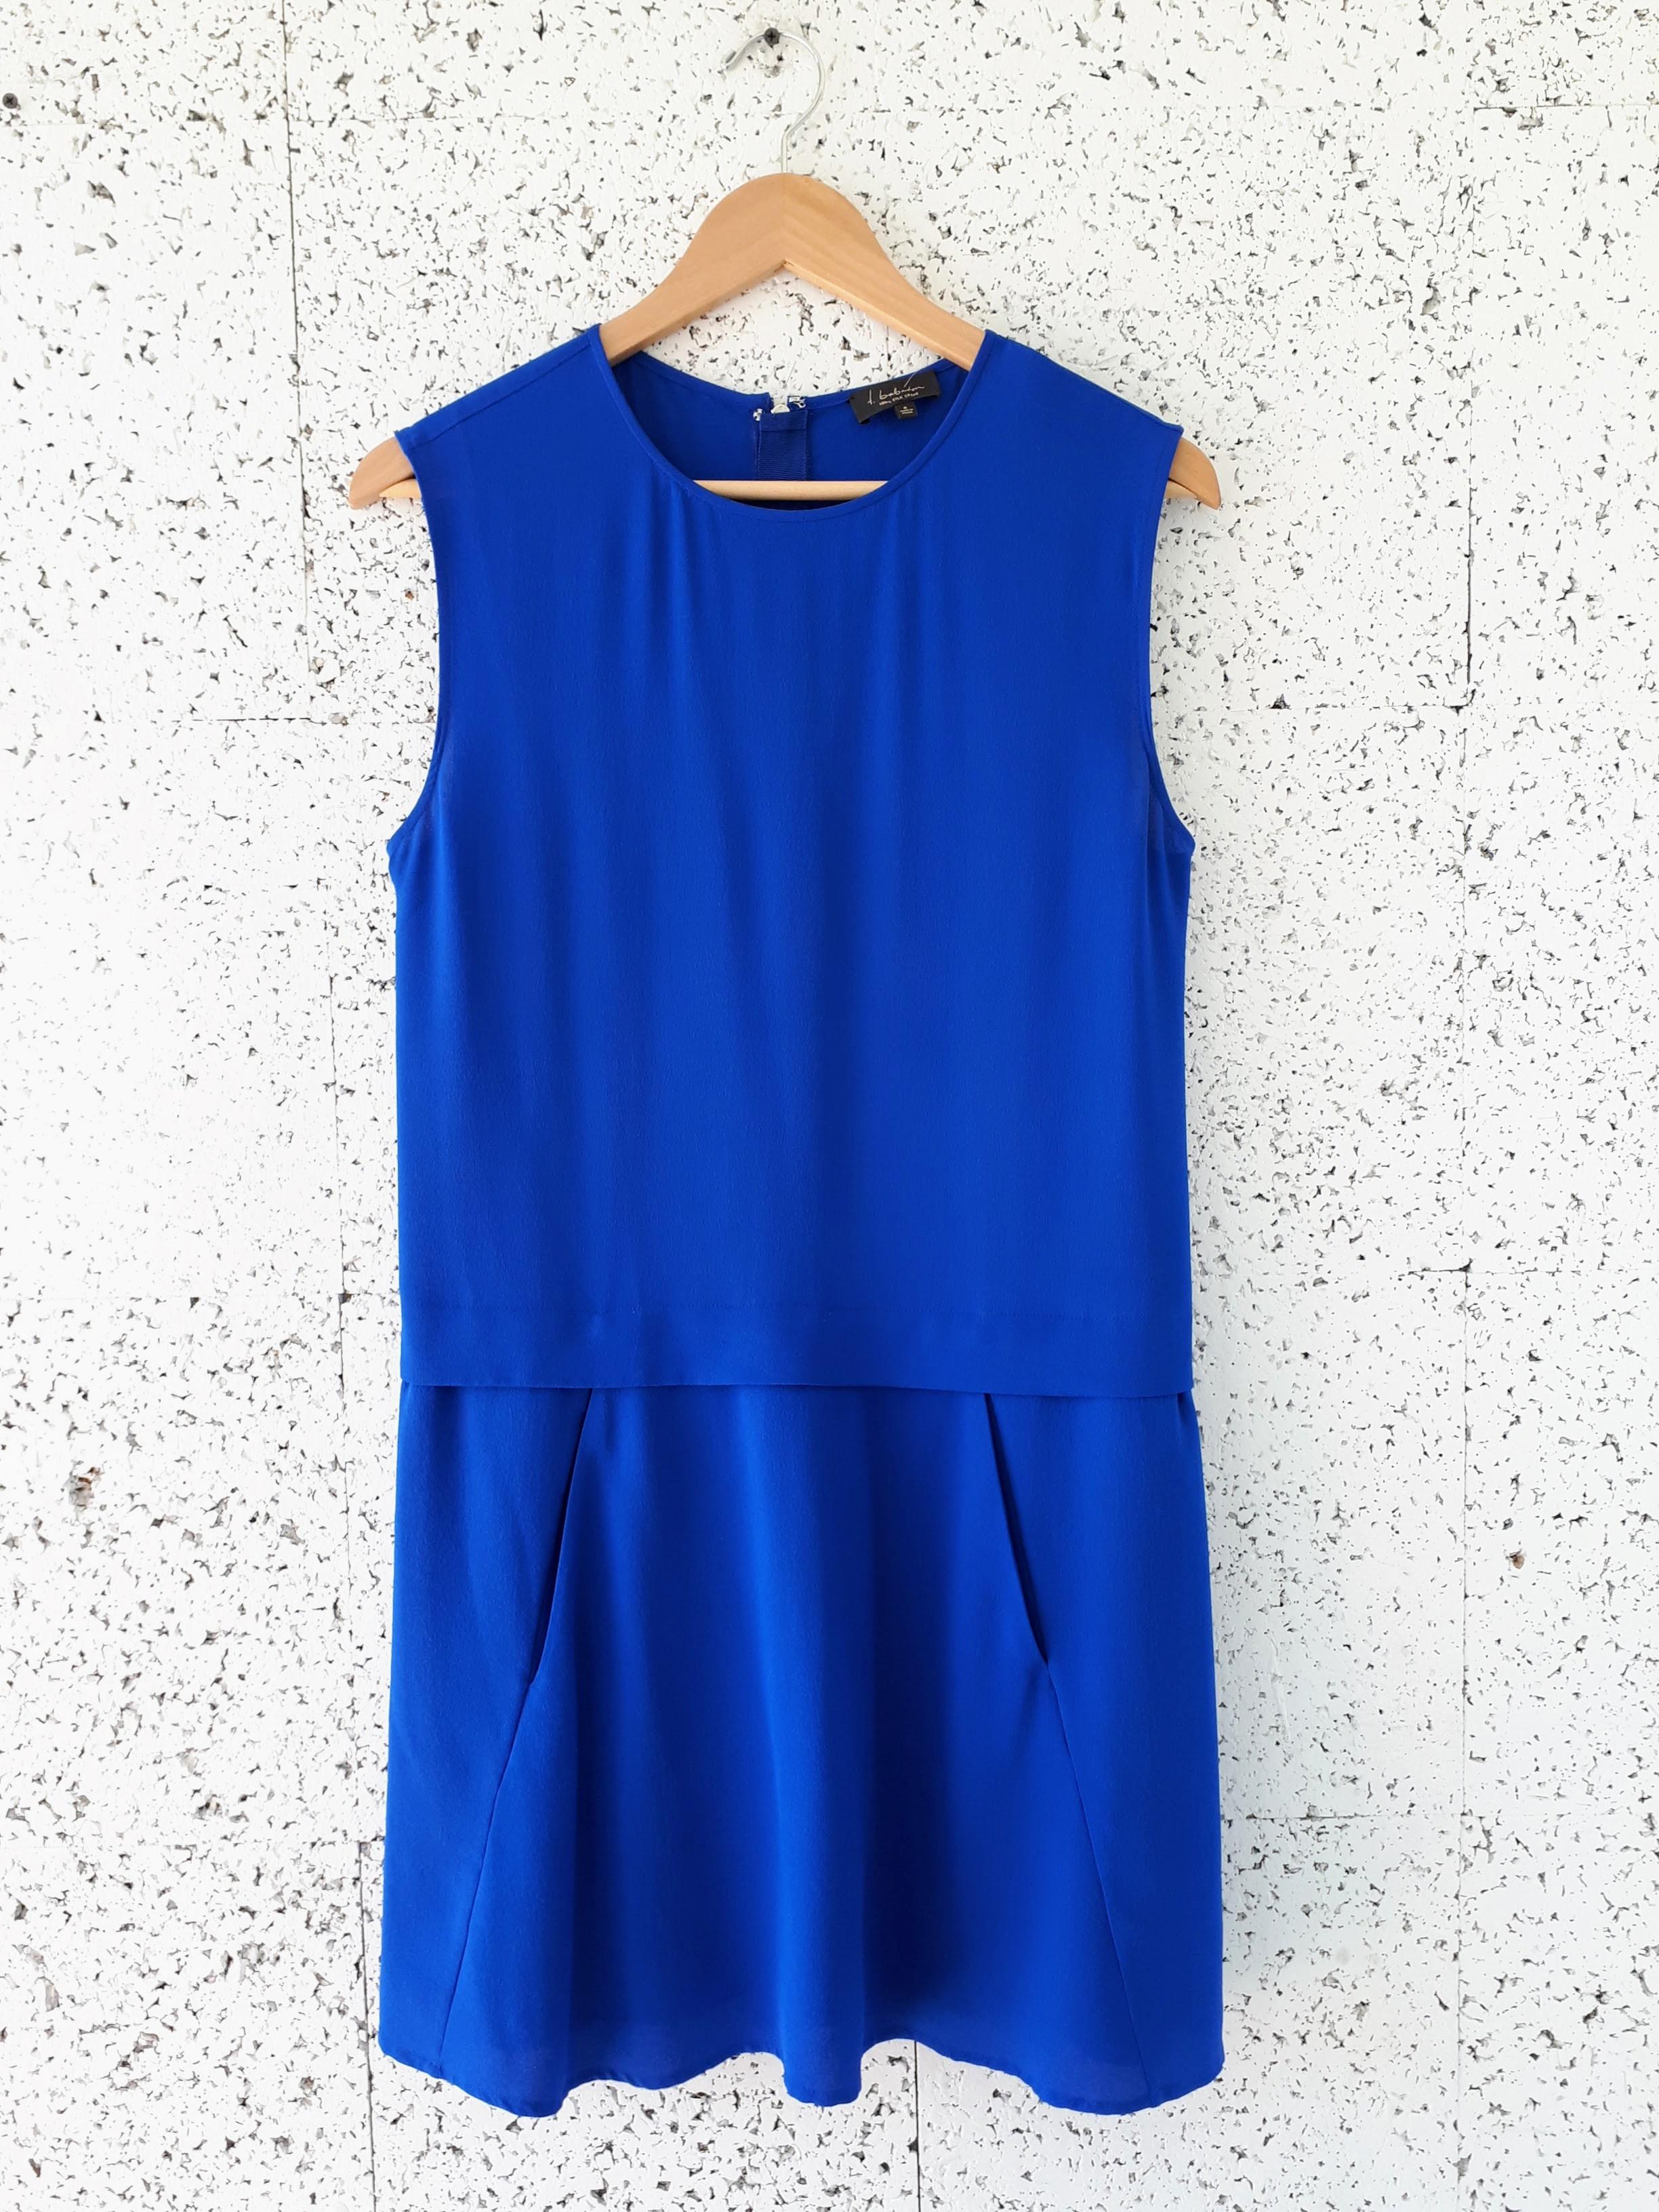 Babaton dress; Size 4, $52